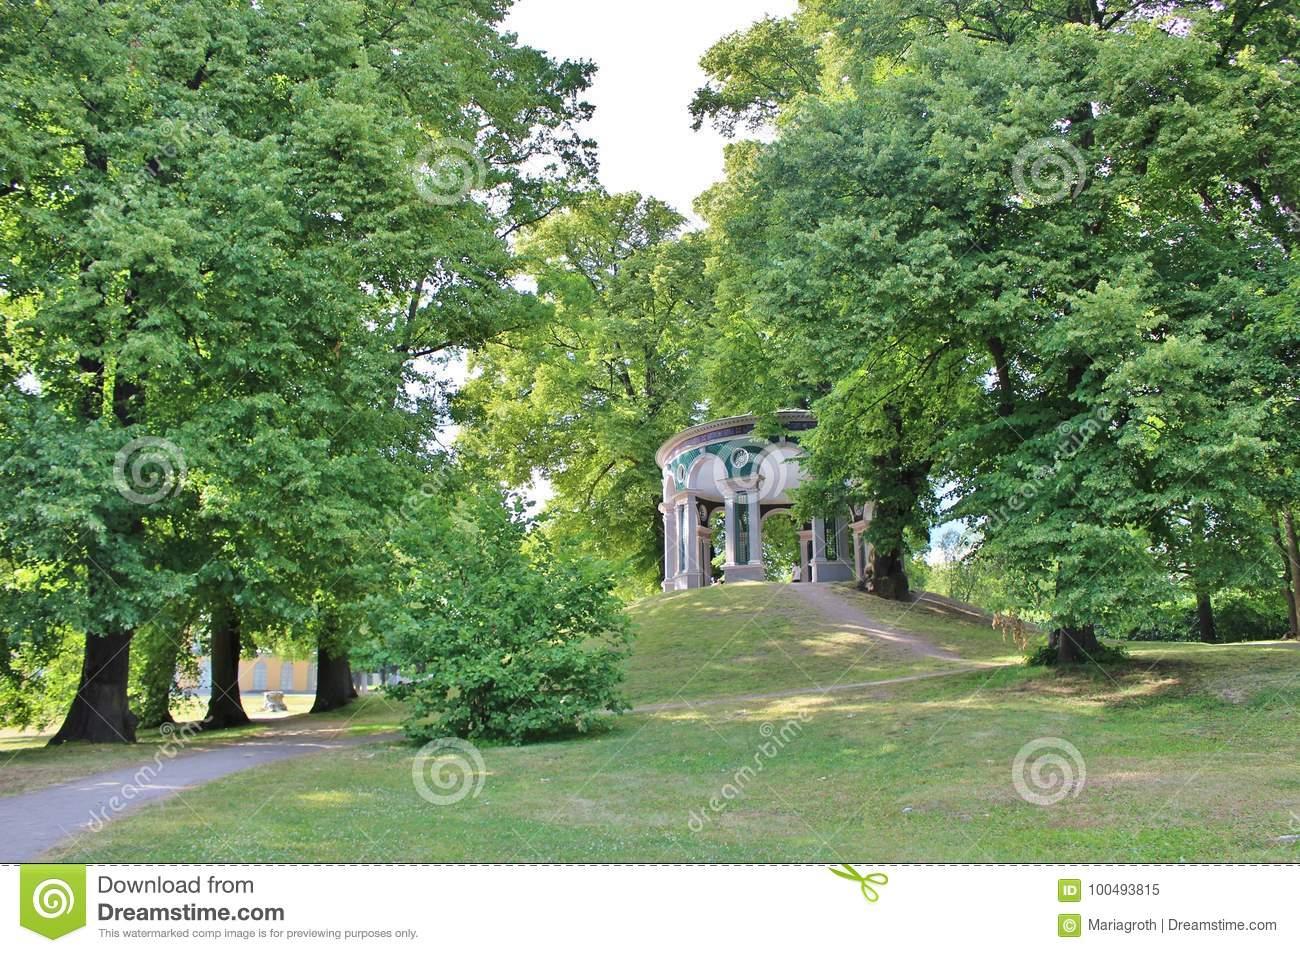 echo temple hagaparken haga park solna municipality stockholm county was founded initiative gustav iii